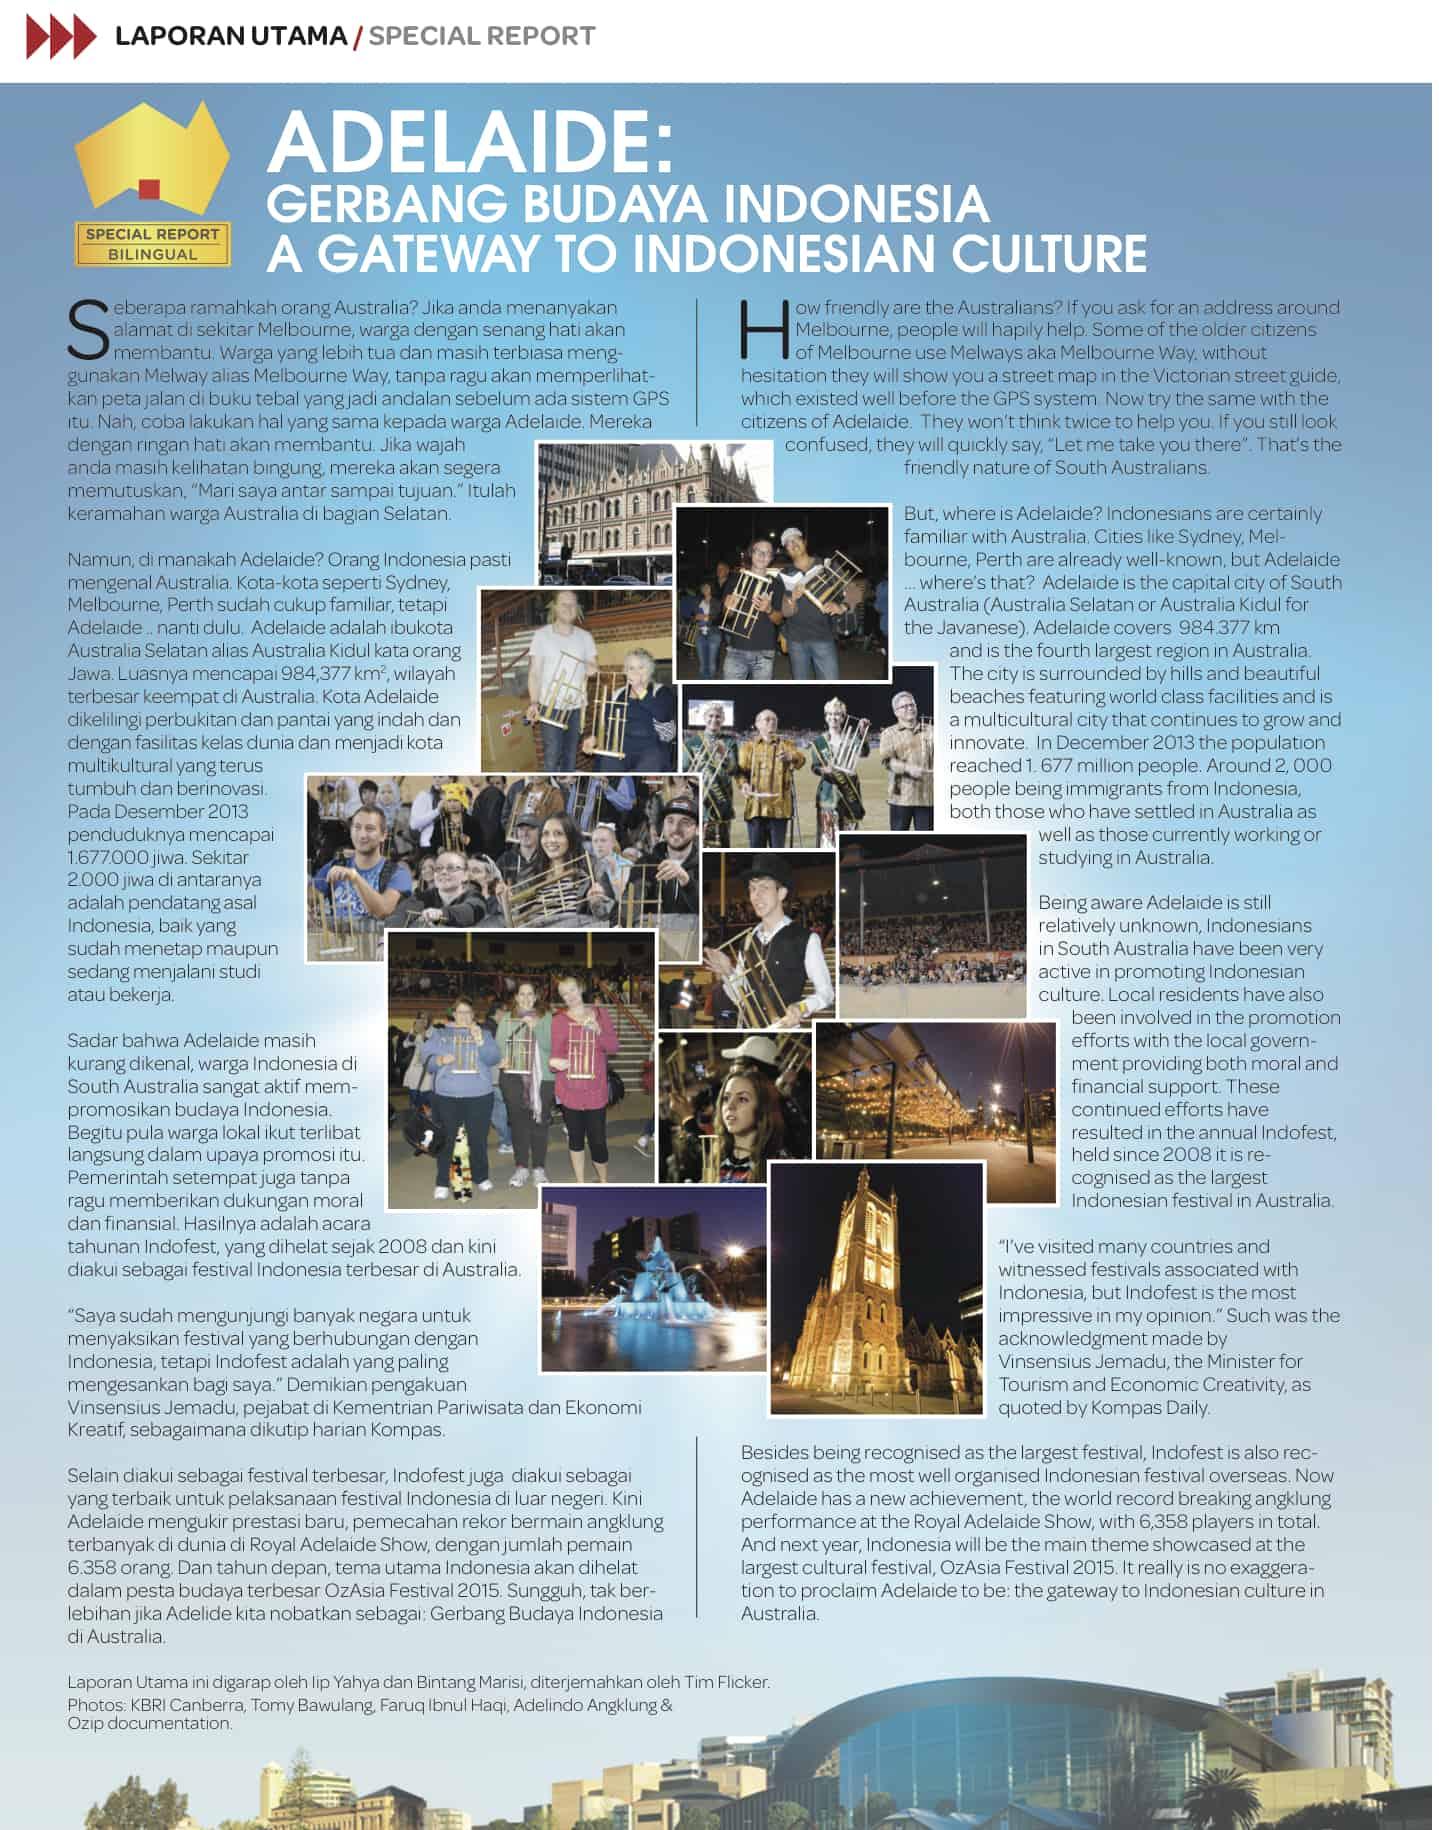 adelaide- gerbang budaya indonesia